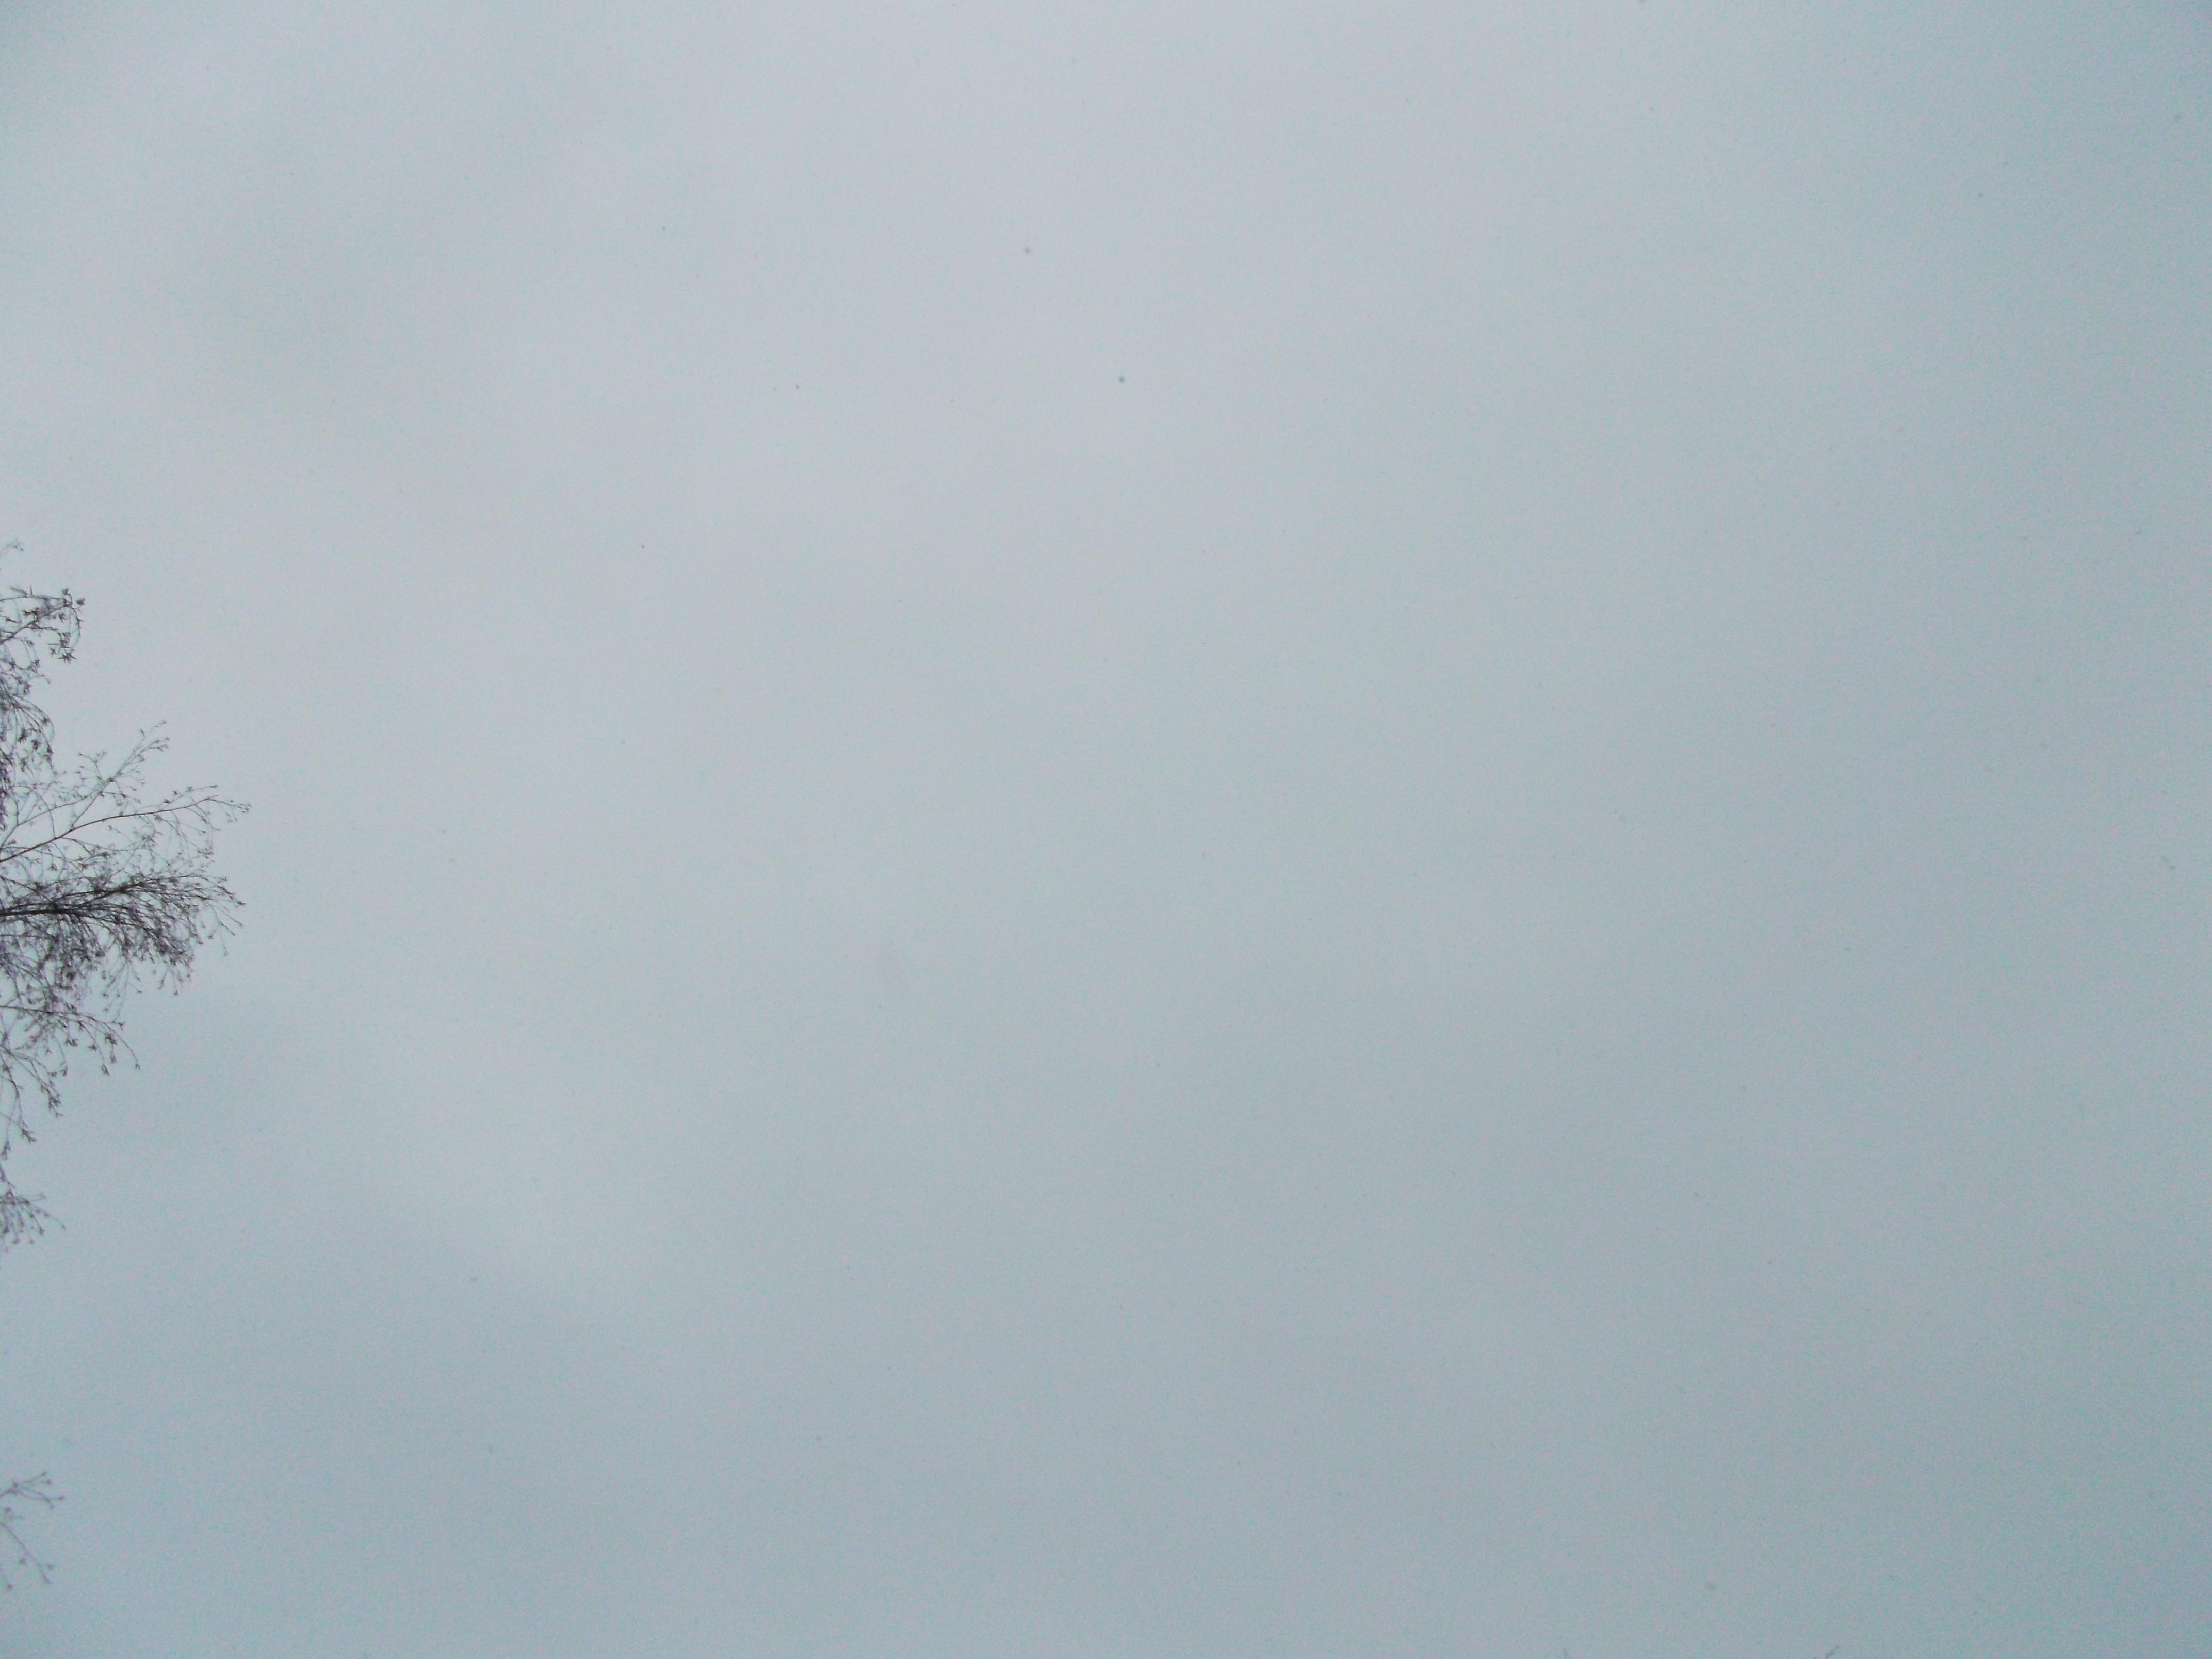 2013-03-12 Longitude -0.360578 Latitude 49.168919 Altitude 29 Heure 15h37